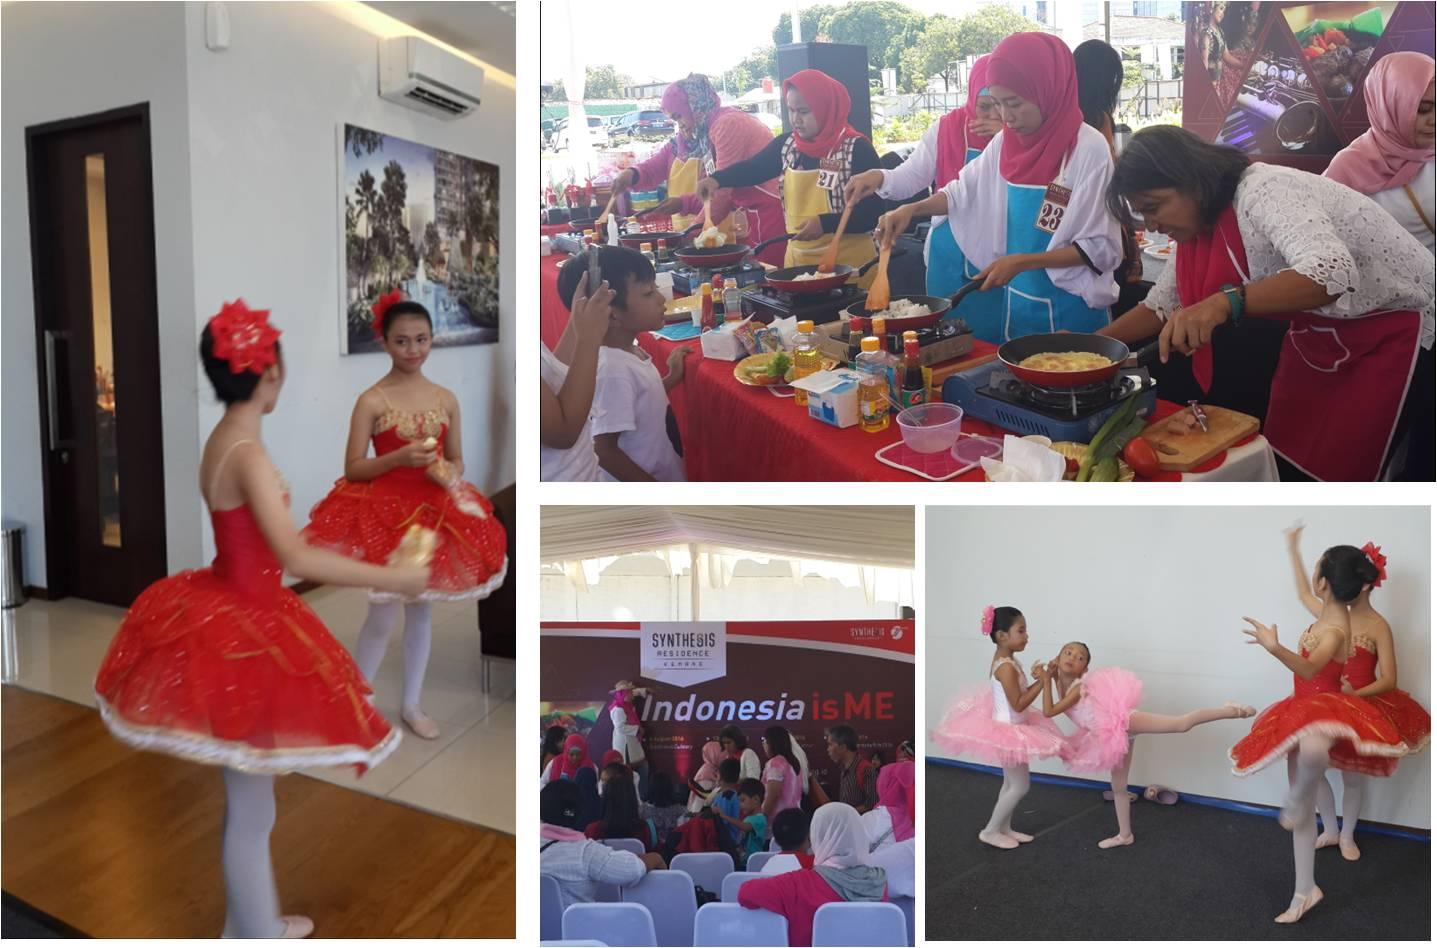 Rangkaian acara Indonesia is Me di Synthesis Residence Kemang